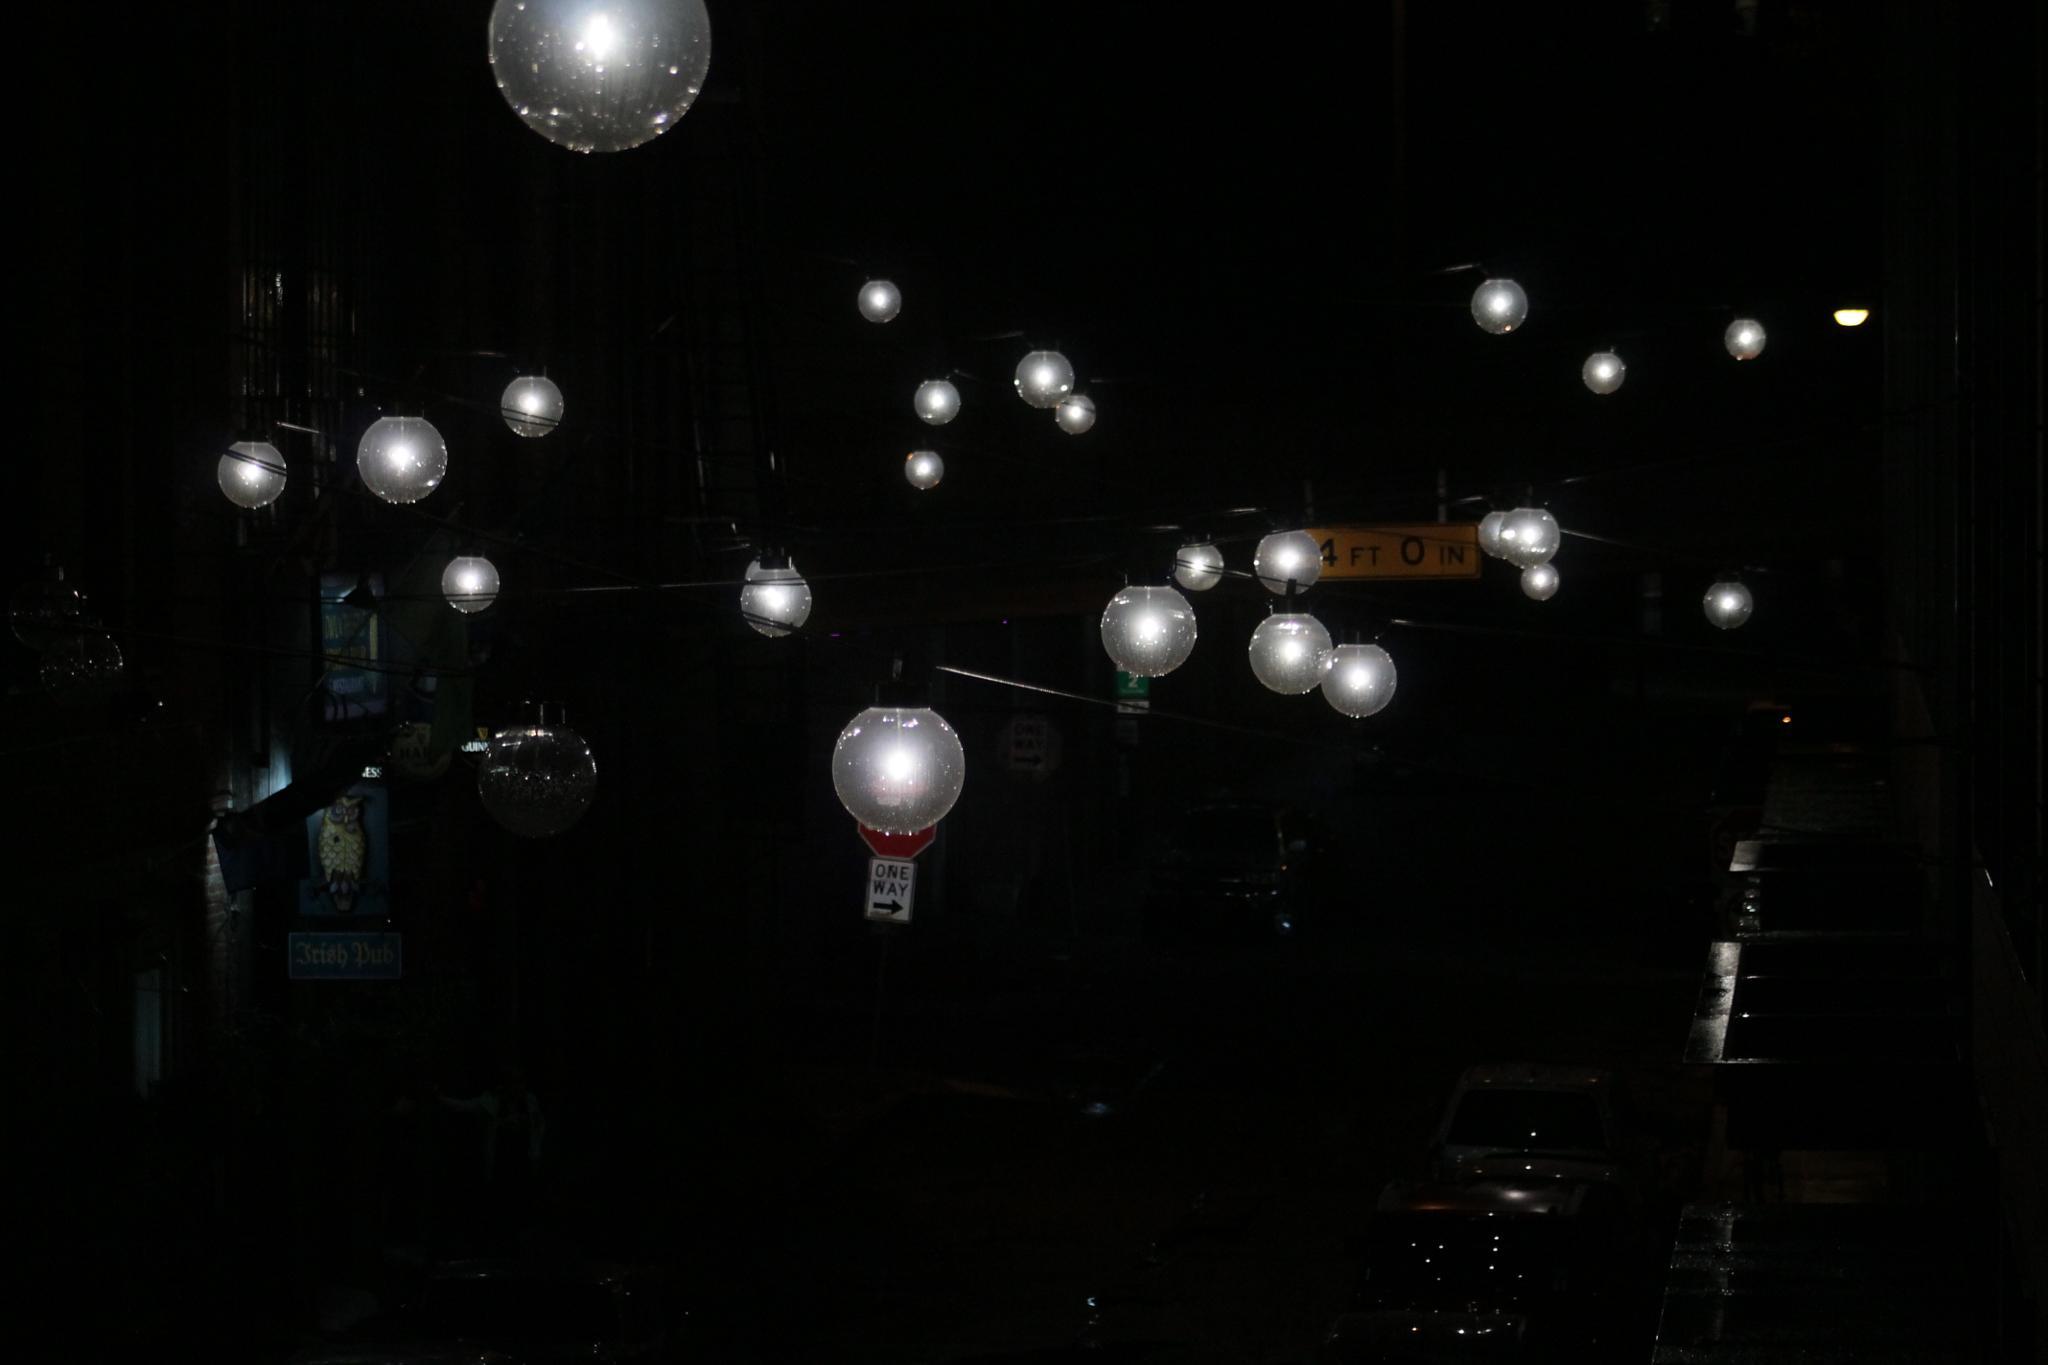 Streetlights in the dark by wgrasshopper